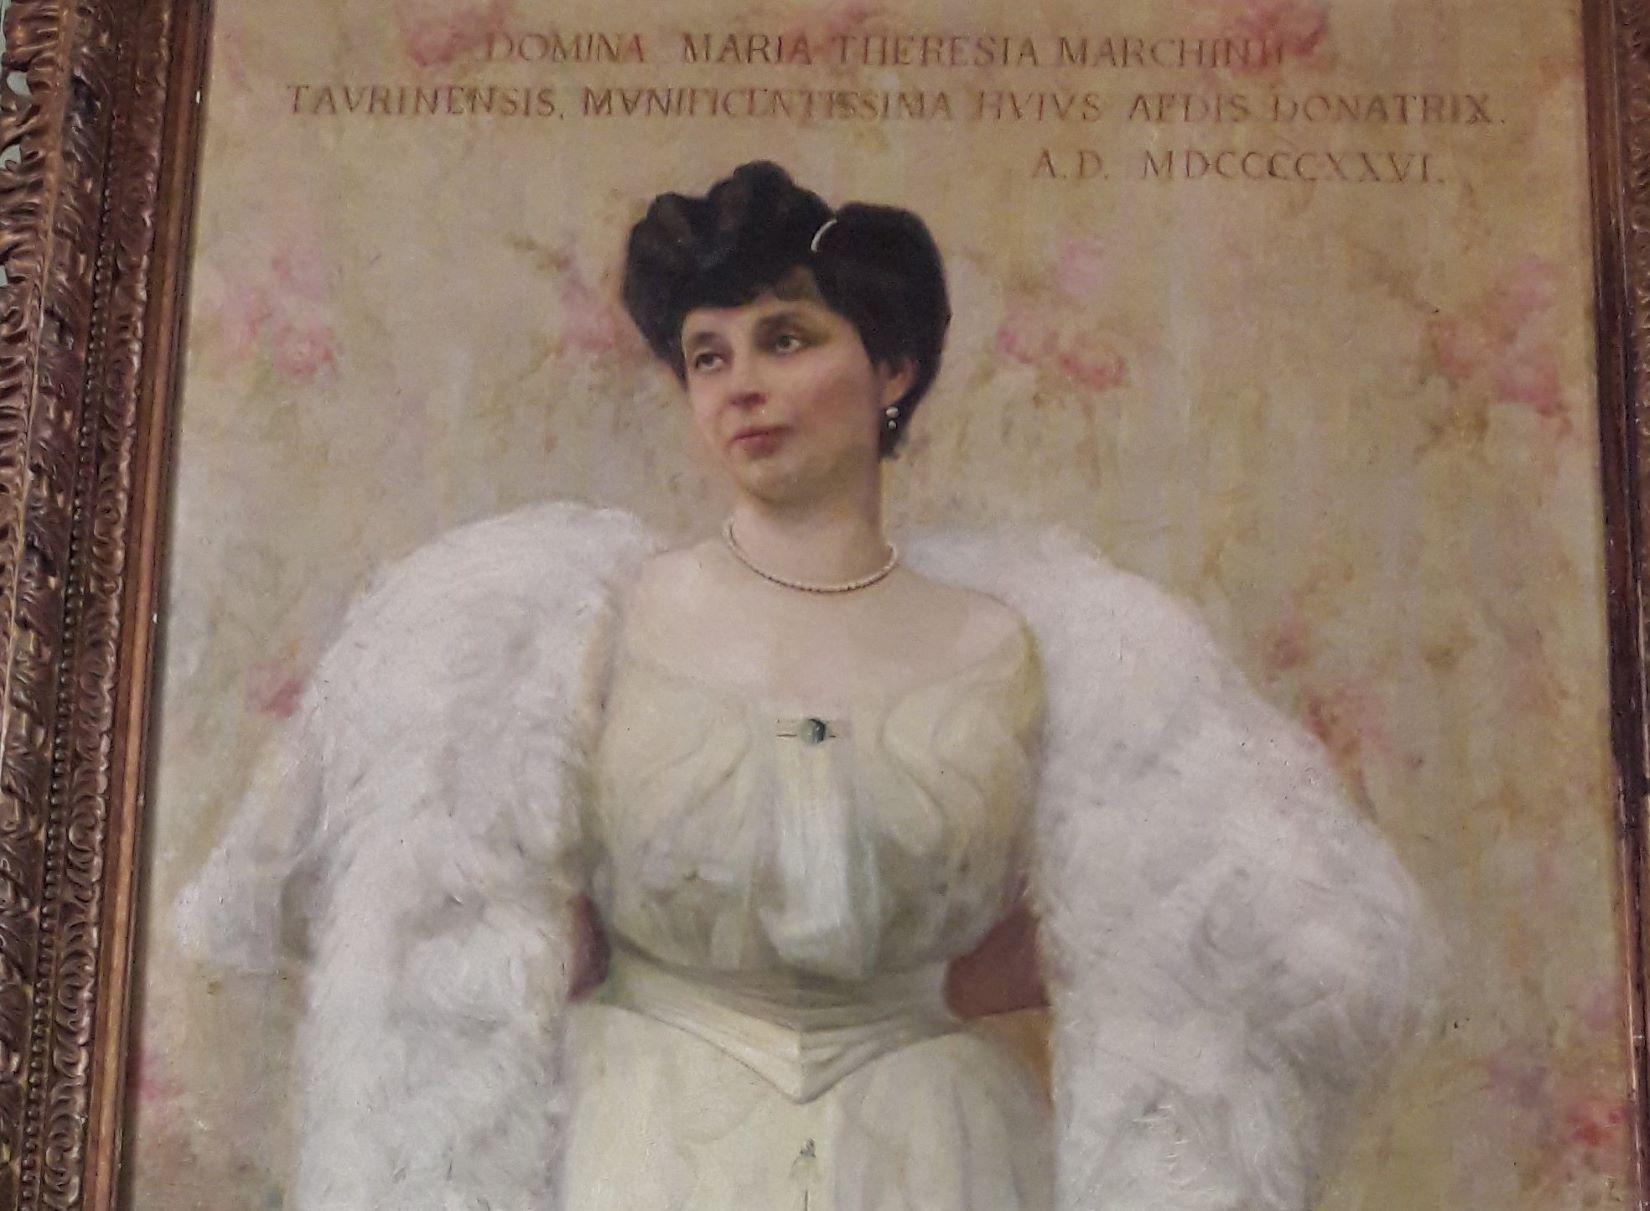 Maria Teresa Marchini